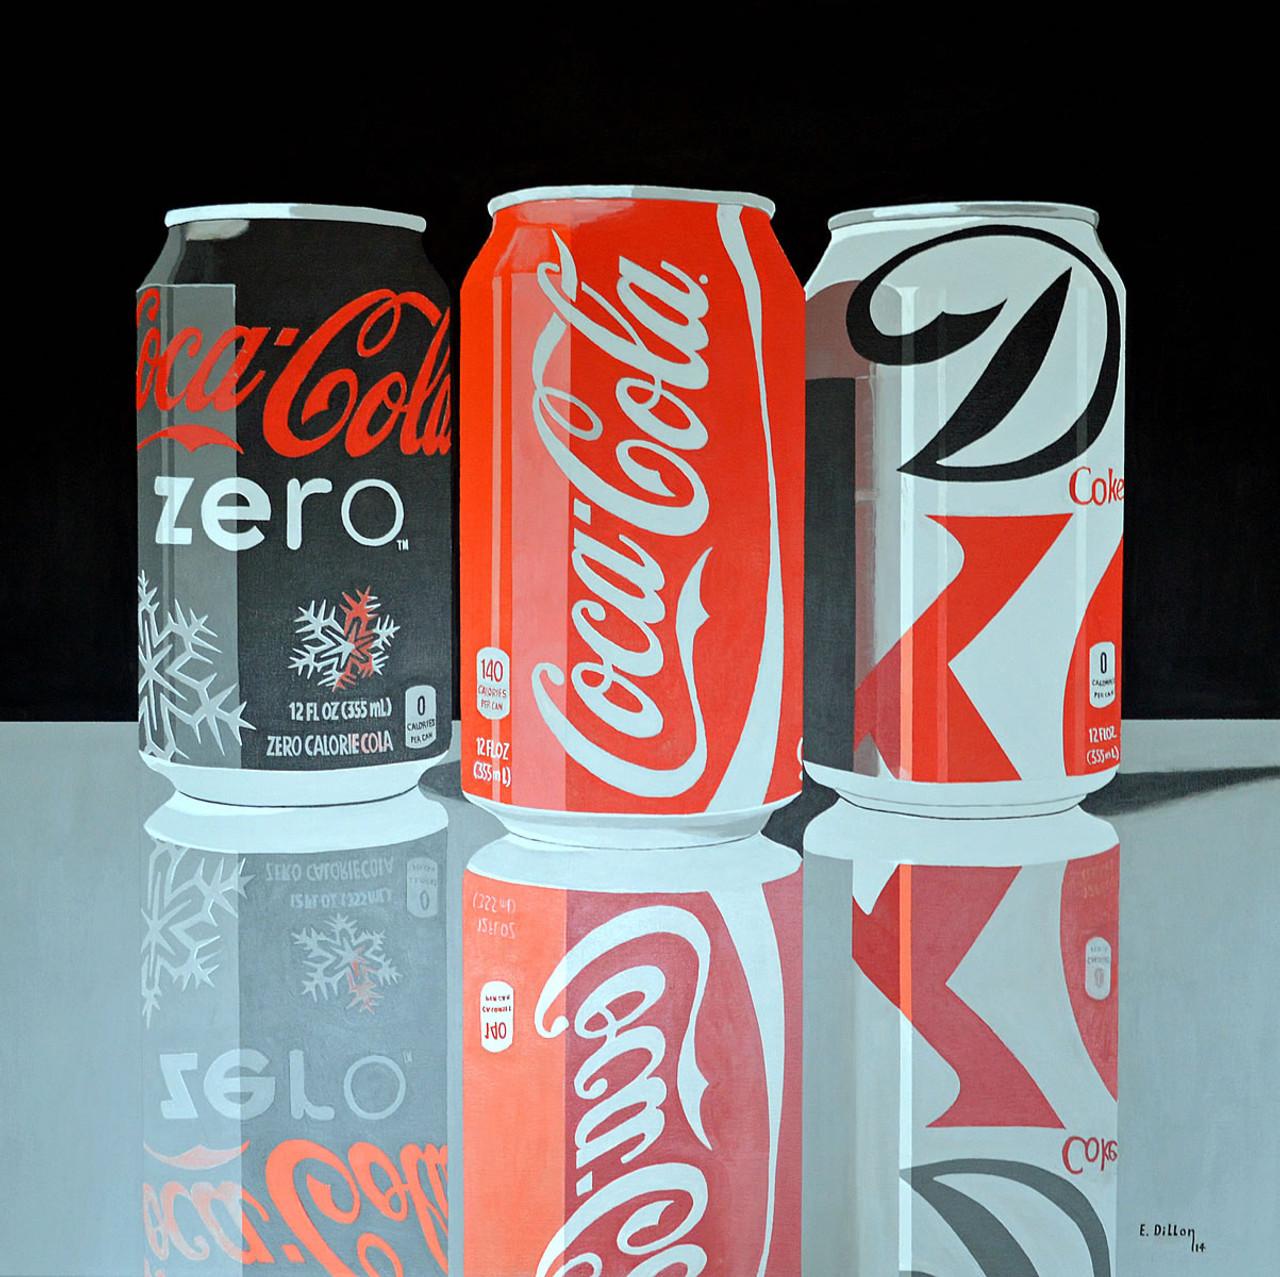 The Three Cokes